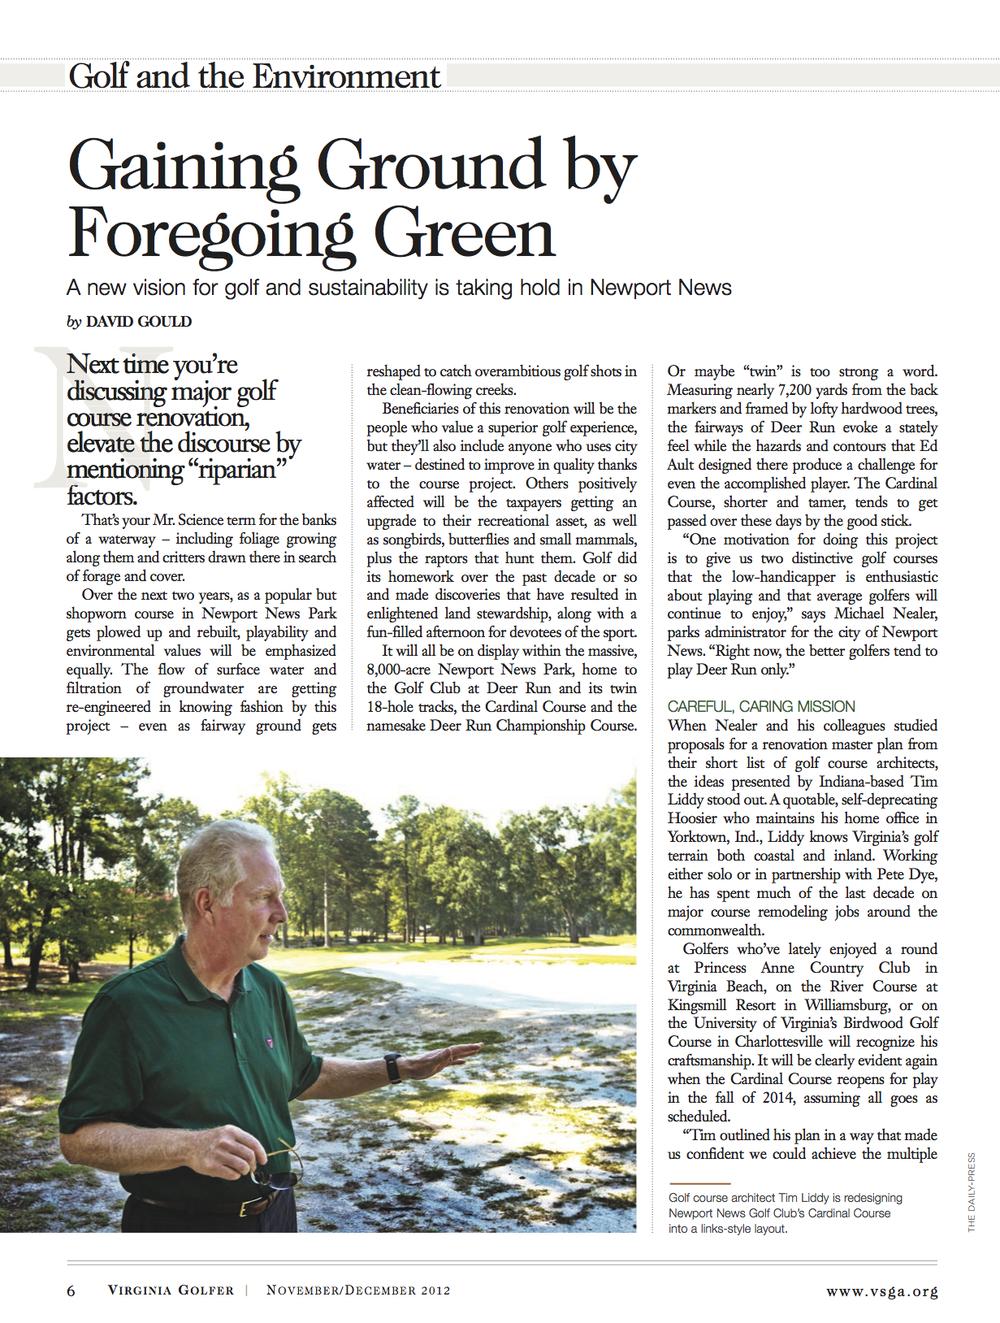 a Gaining Ground by Foregoing Green Article (November December 2012 Virginia Golfer).jpg